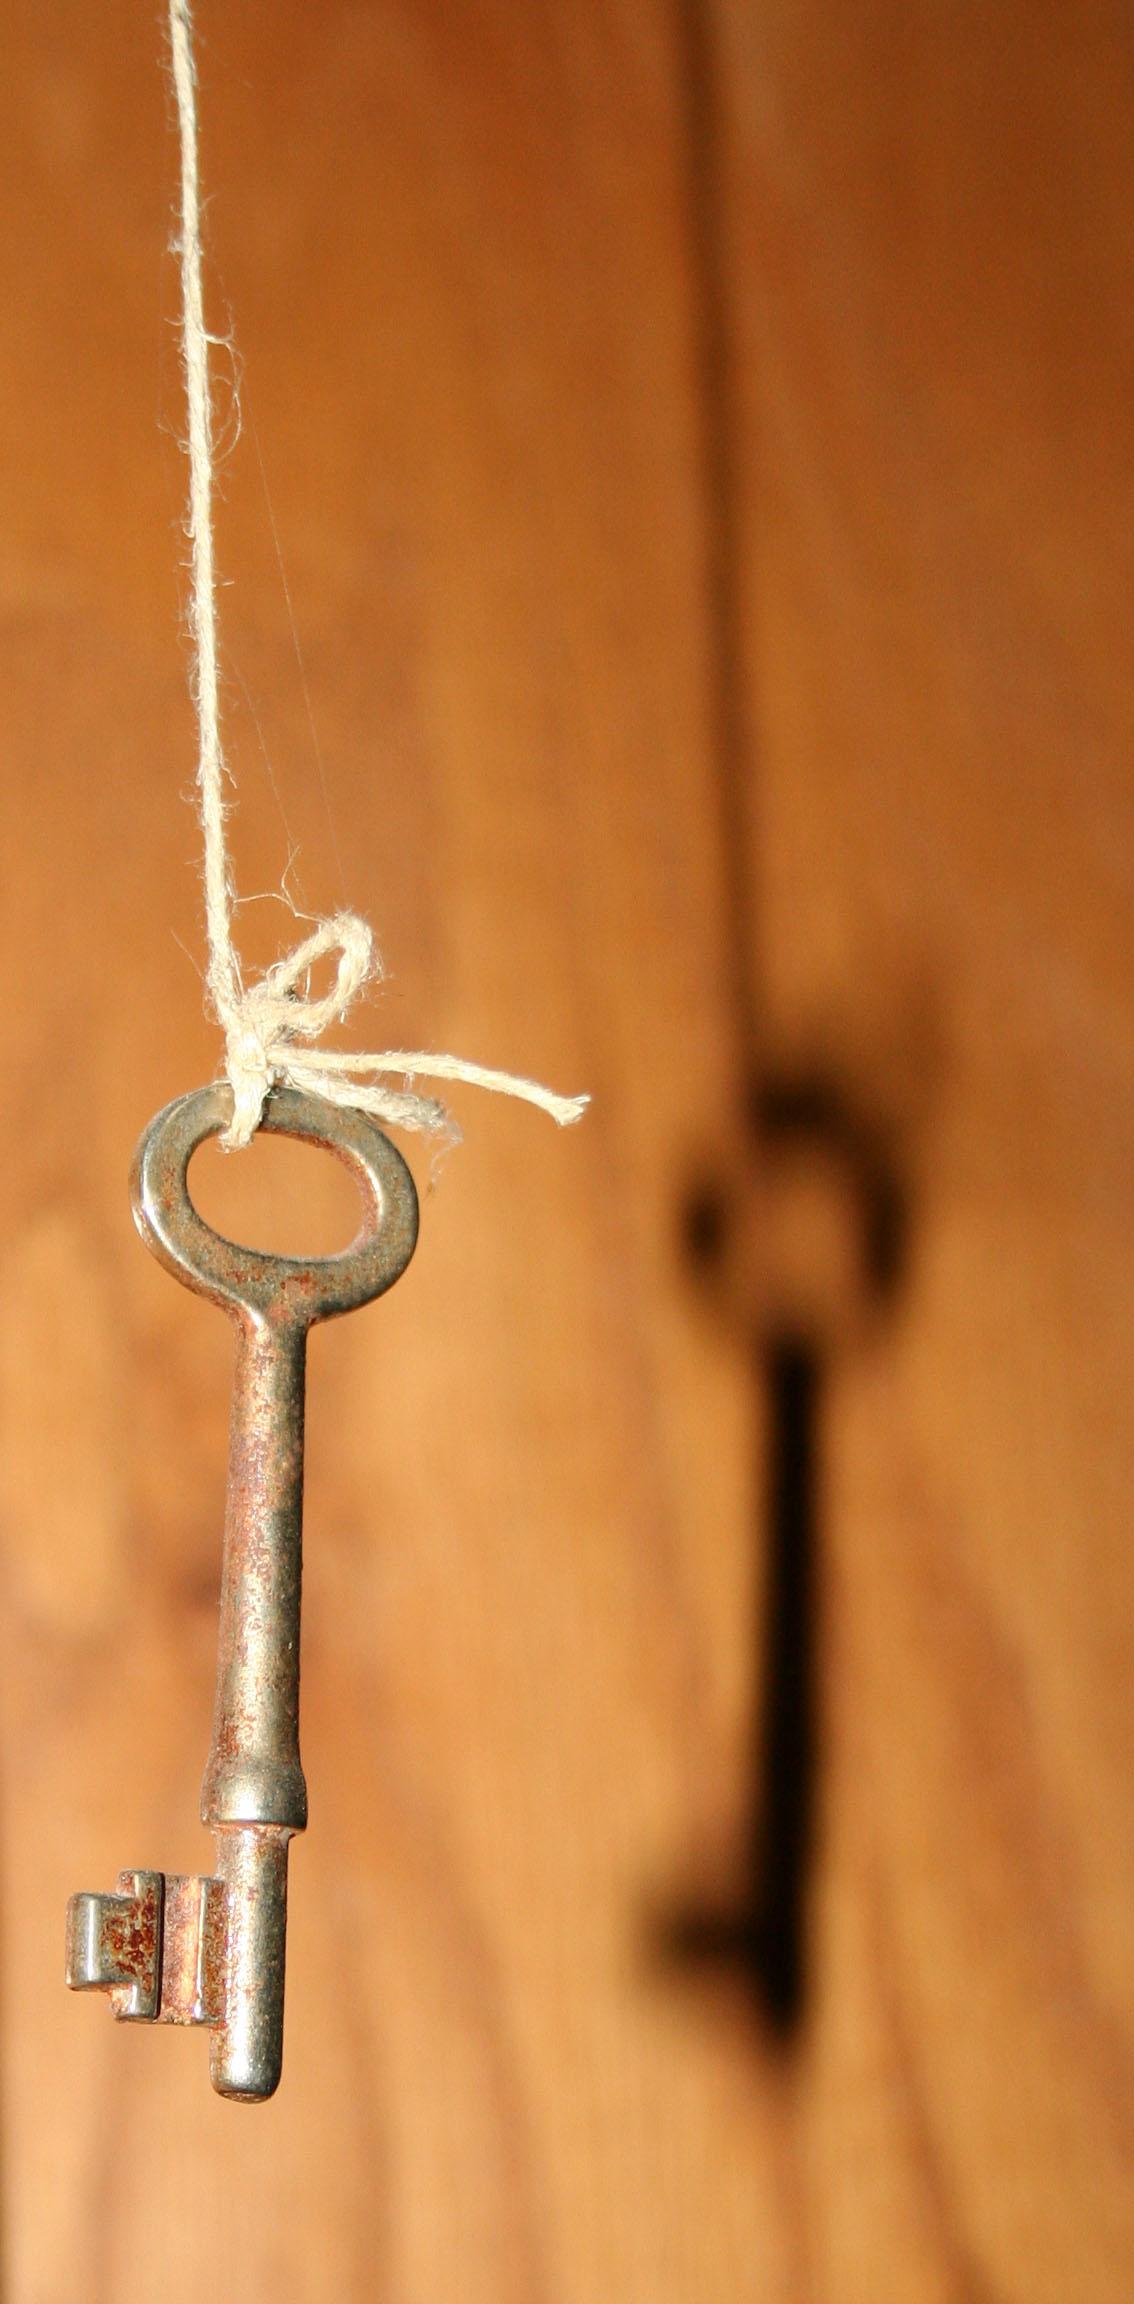 Knick-Knacks 17 - Key by Falln-Stock